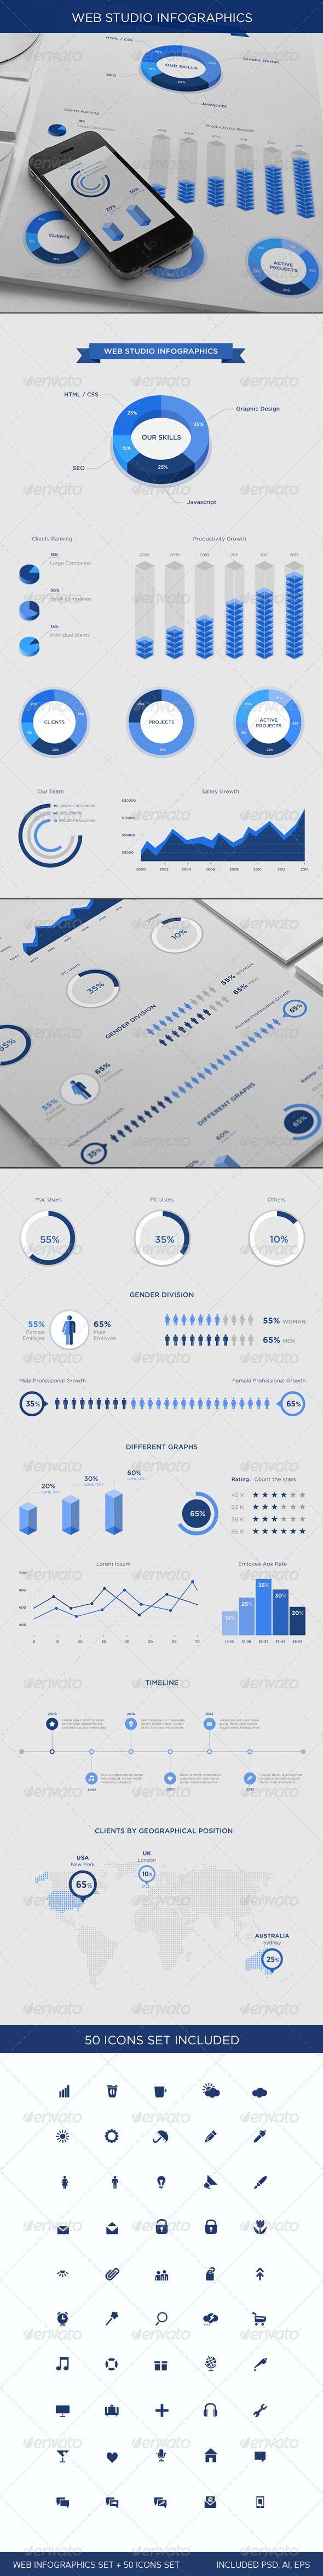 Web Studio Infographics Set — Photoshop PSD #infographics #print infographics • Available here → https://graphicriver.net/item/web-studio-infographics-set/6316926?ref=pxcr